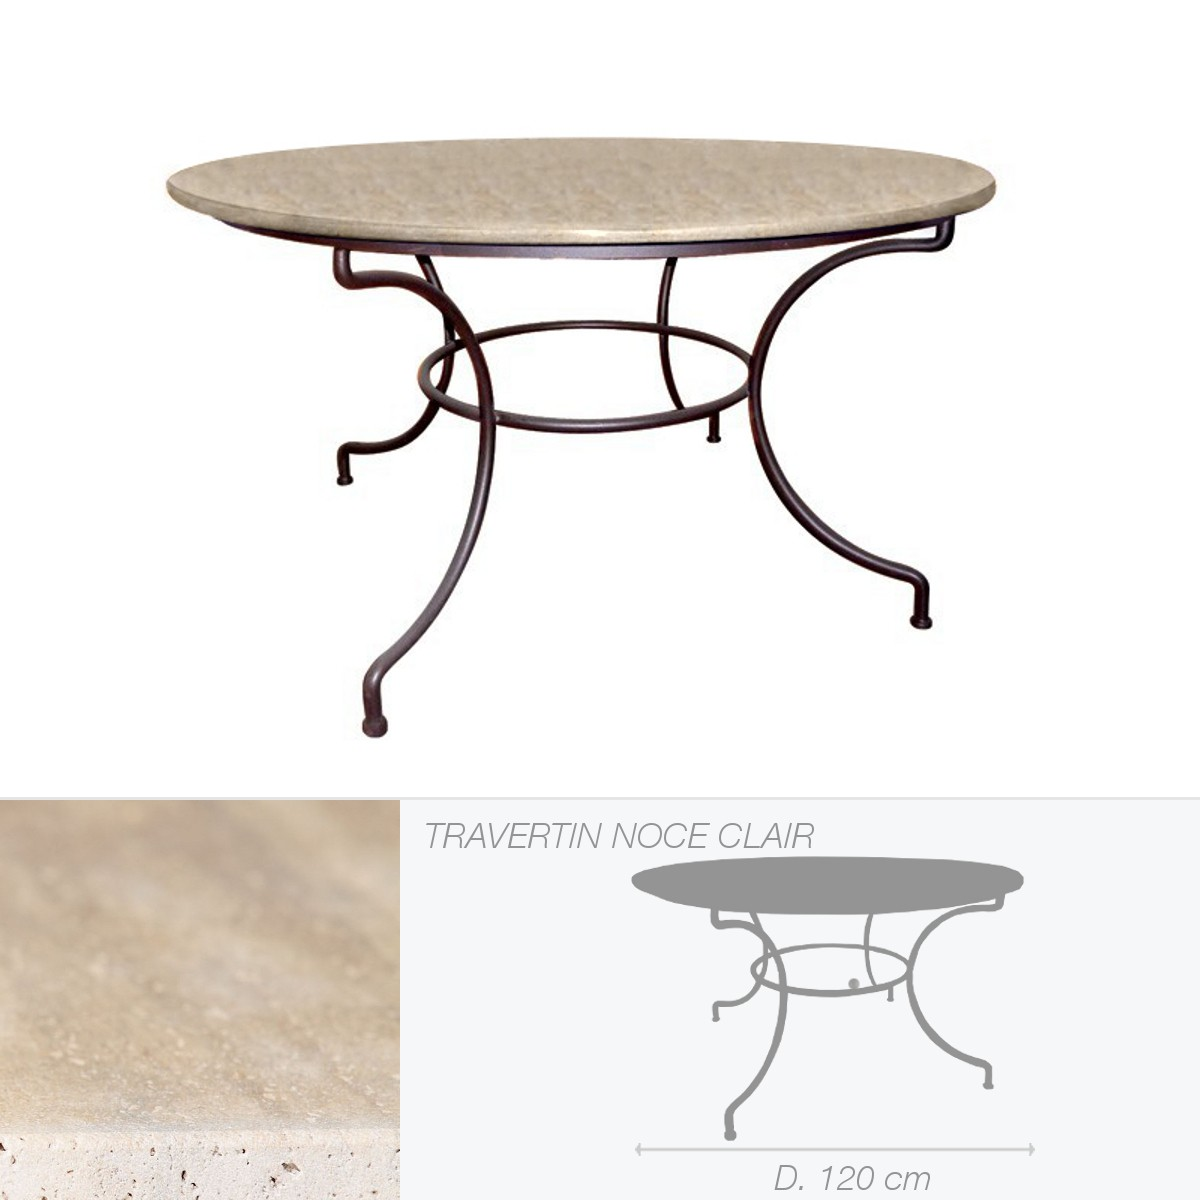 table ronde en pierre de travertin noce clair. Black Bedroom Furniture Sets. Home Design Ideas